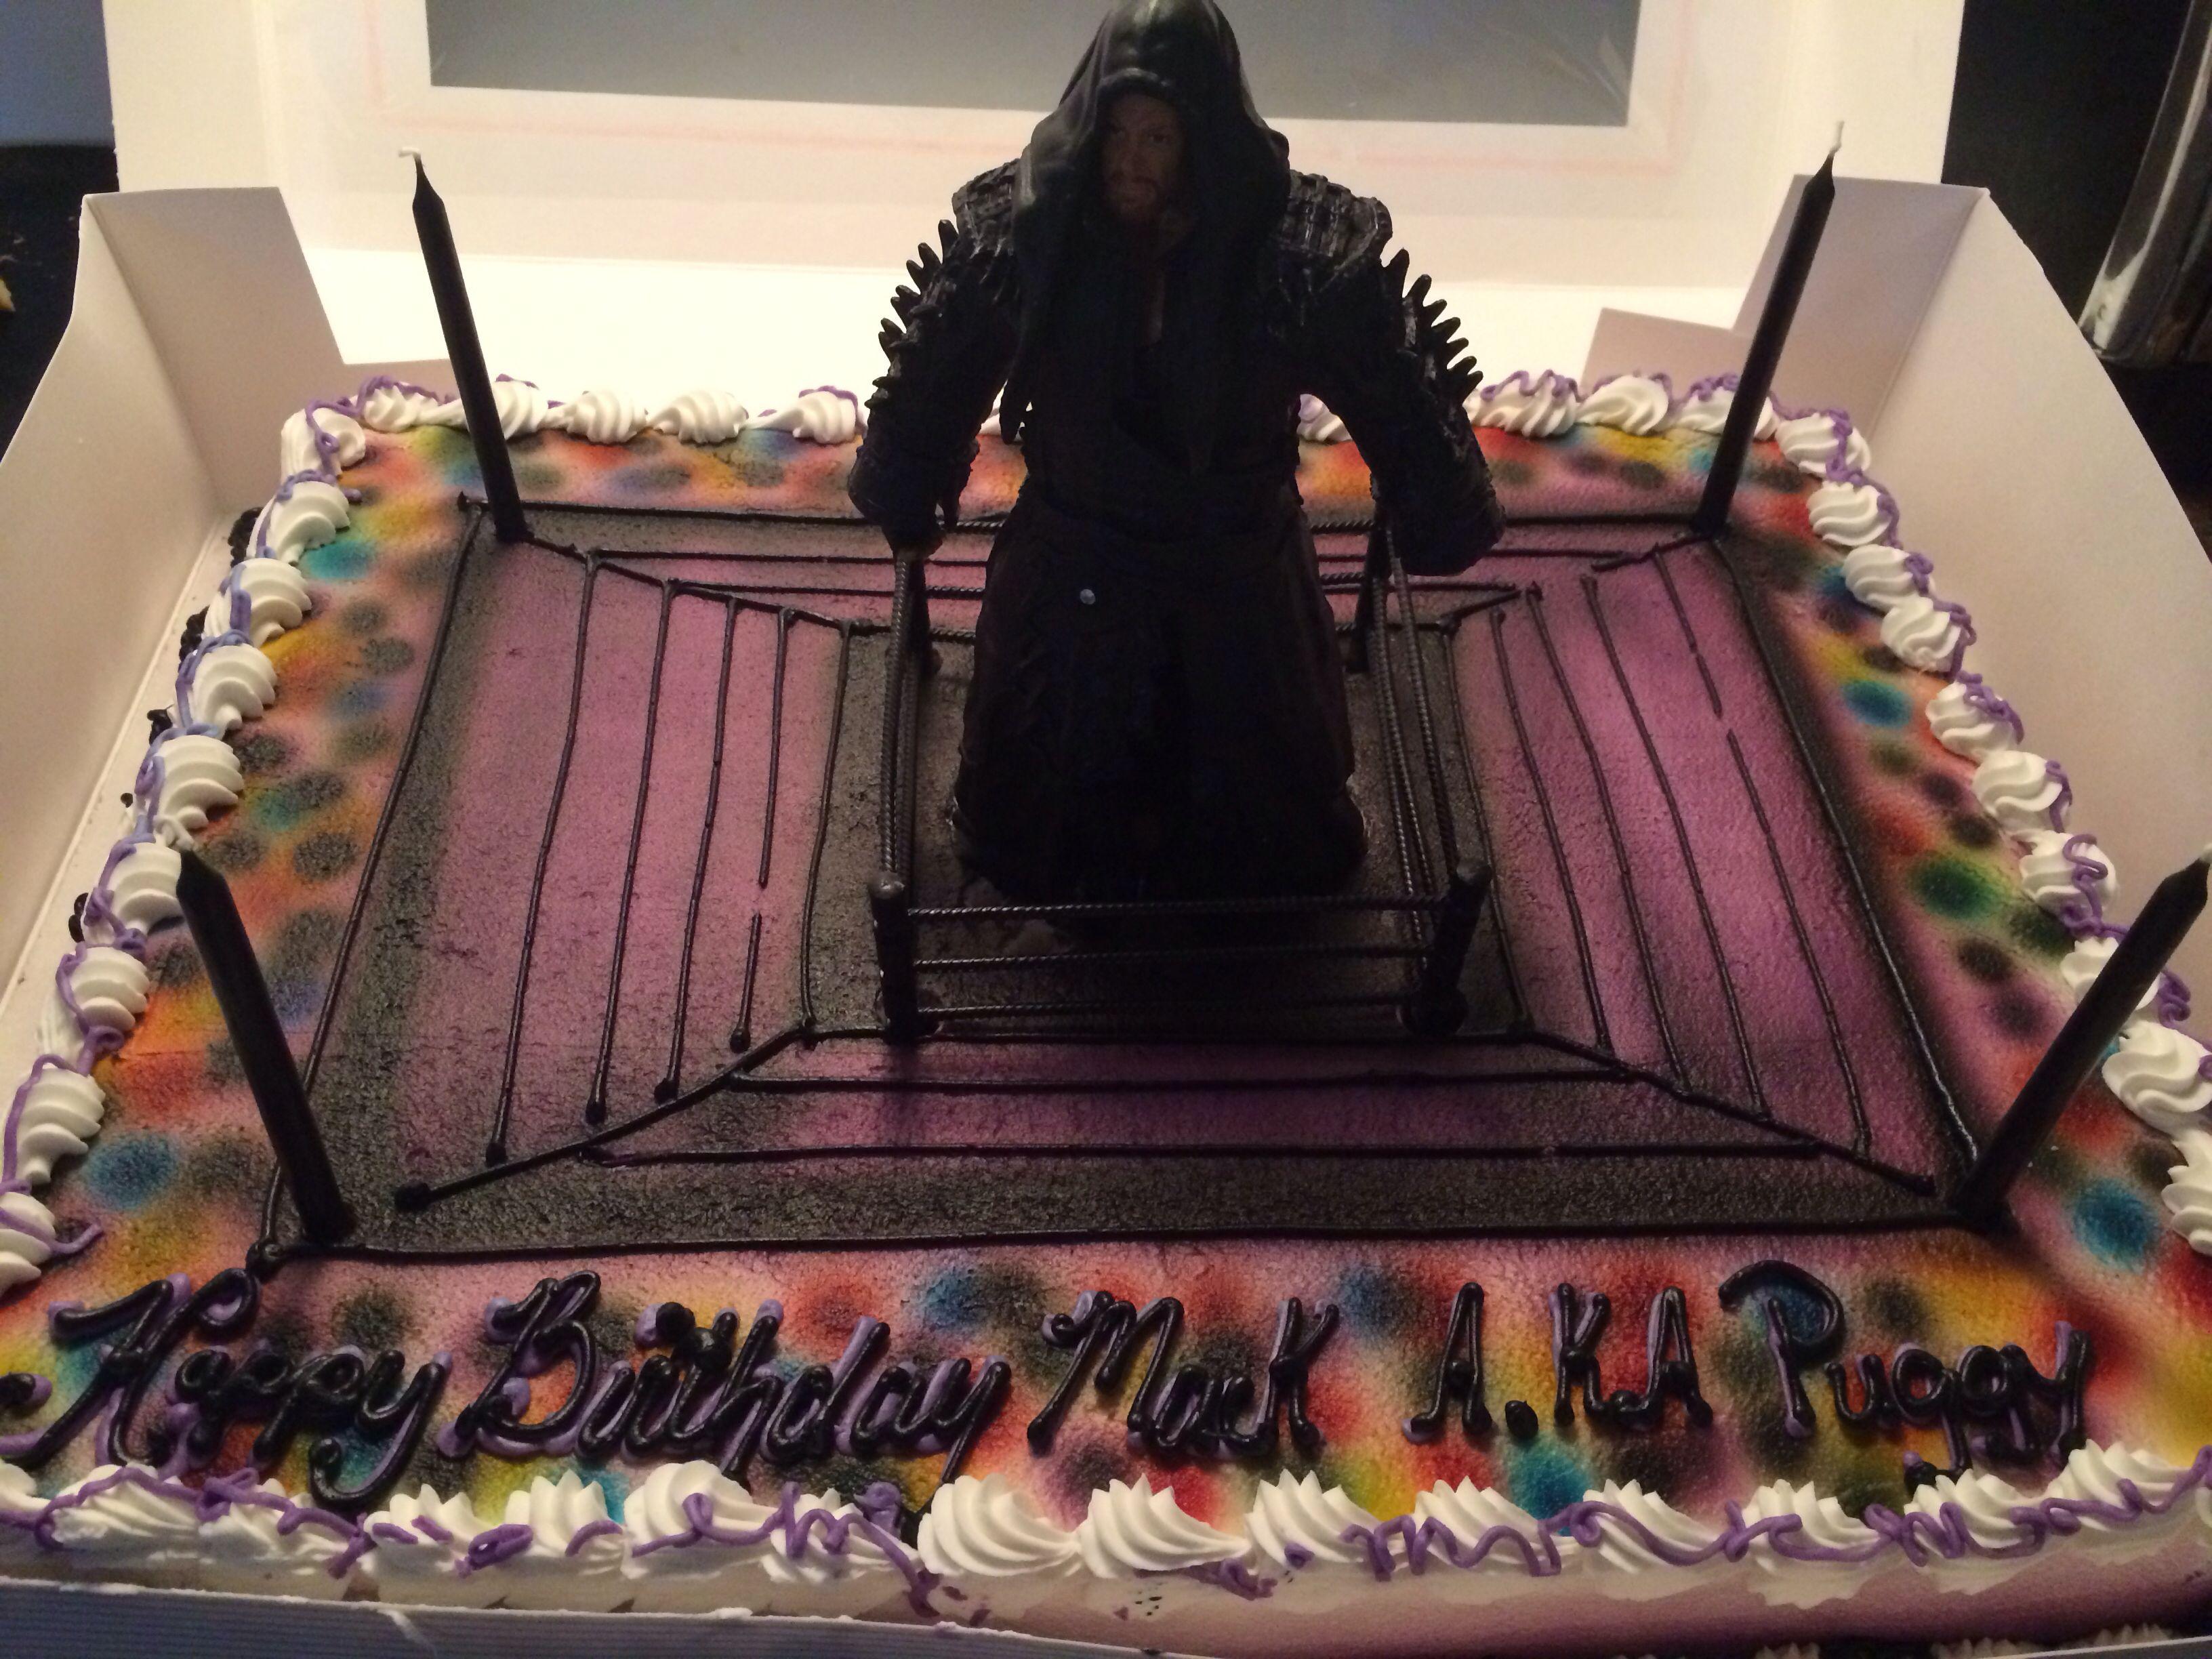 Undertaker cake